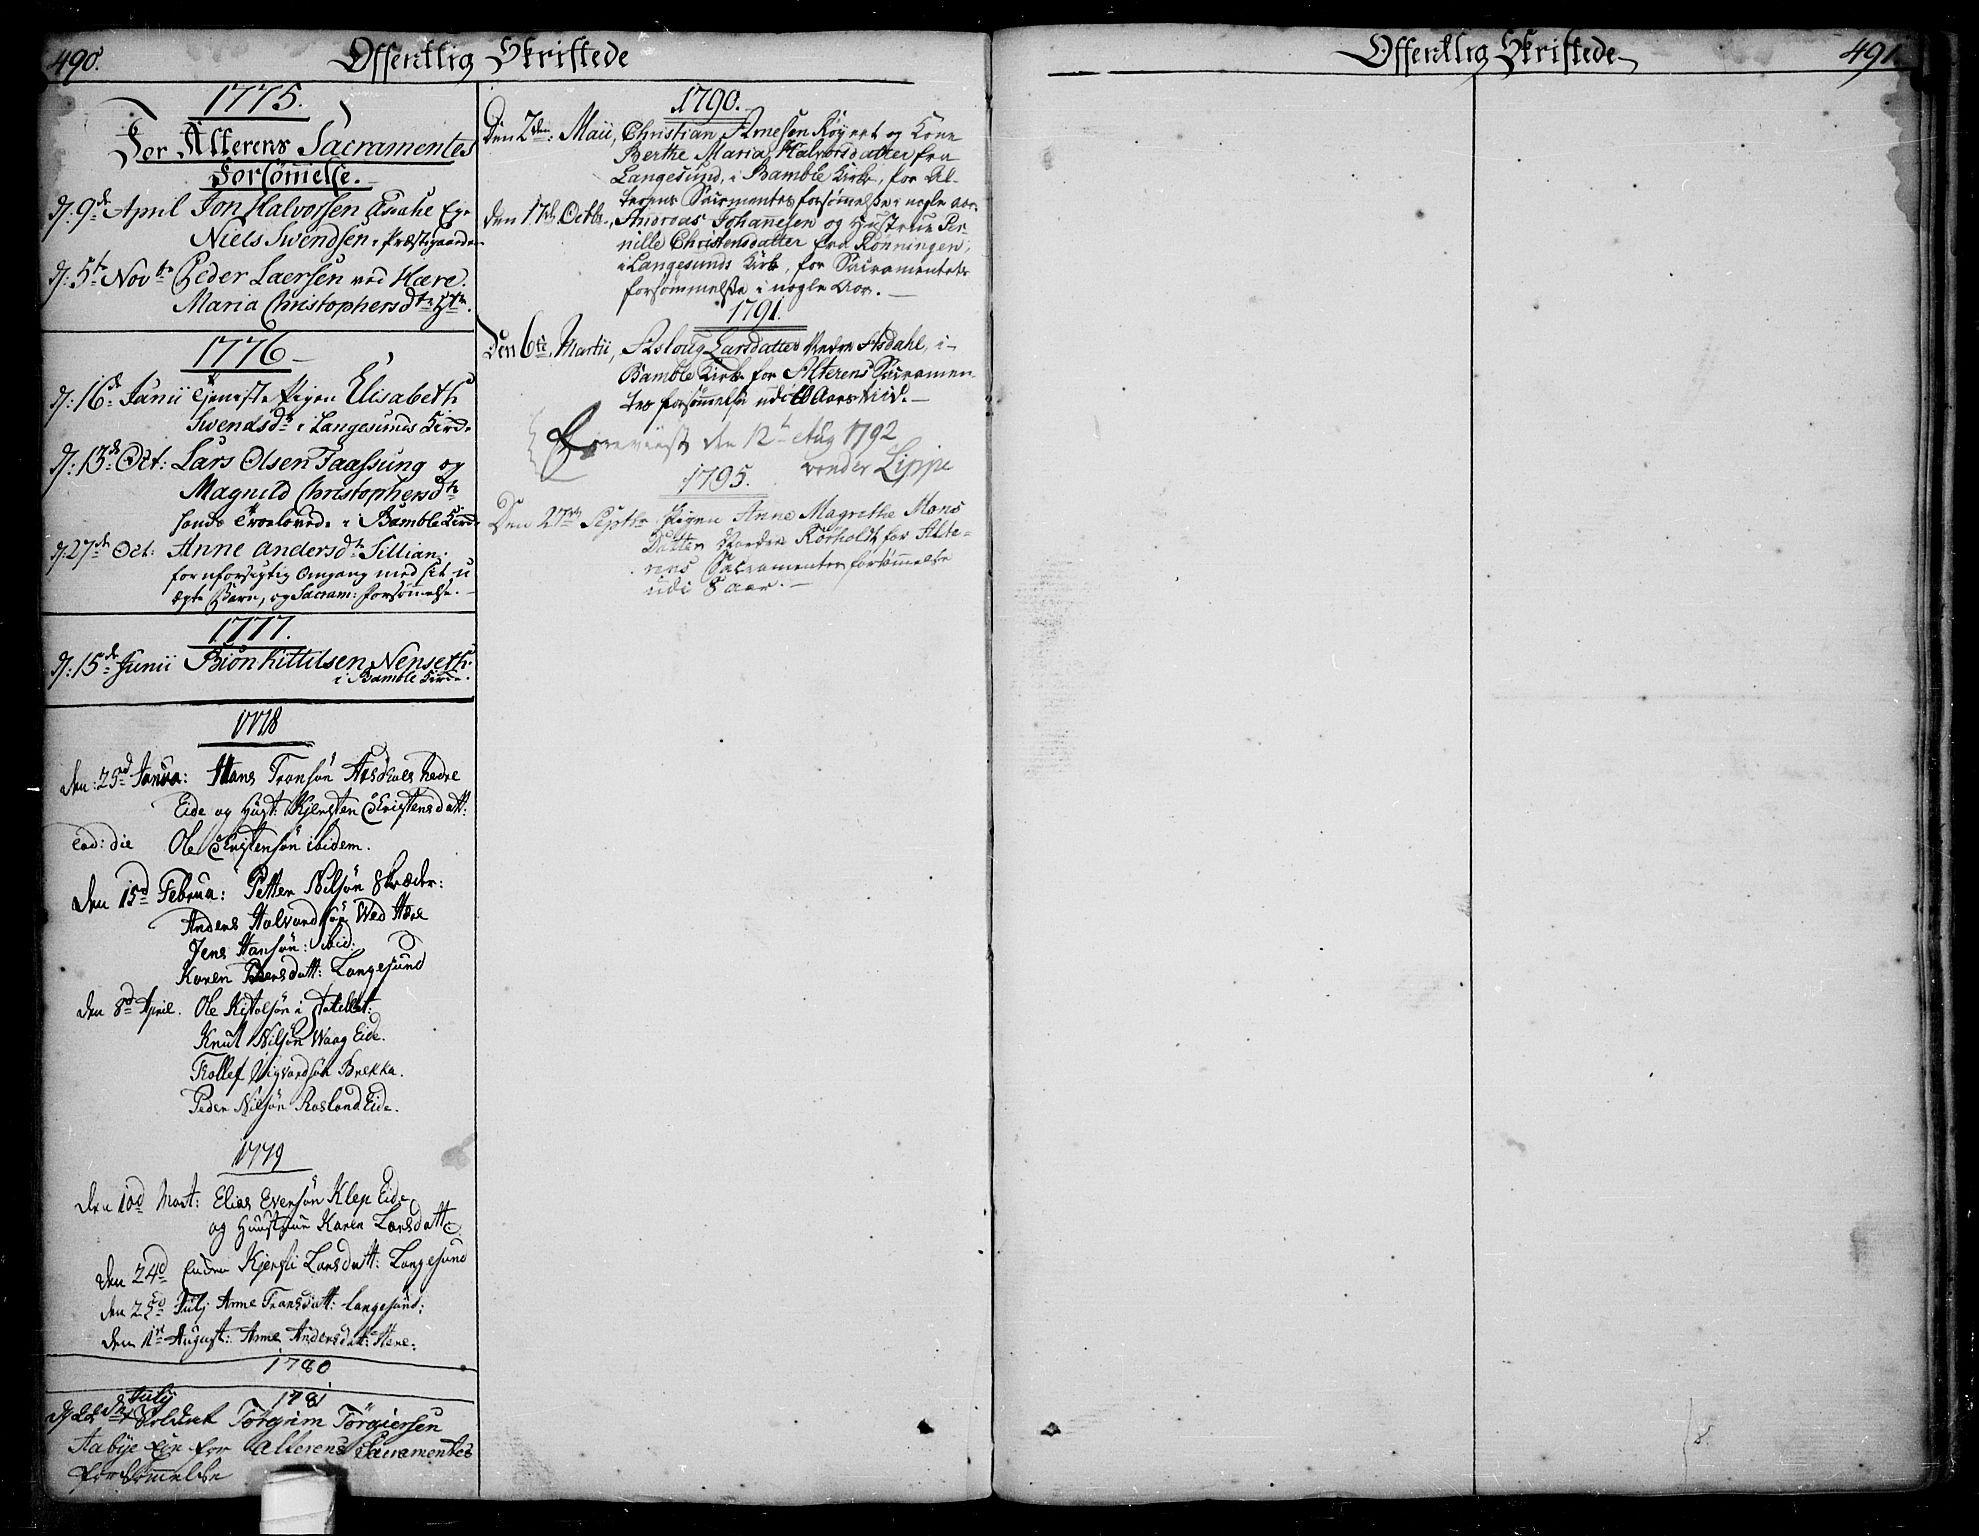 SAKO, Bamble kirkebøker, F/Fa/L0002: Ministerialbok nr. I 2, 1775-1814, s. 490-491